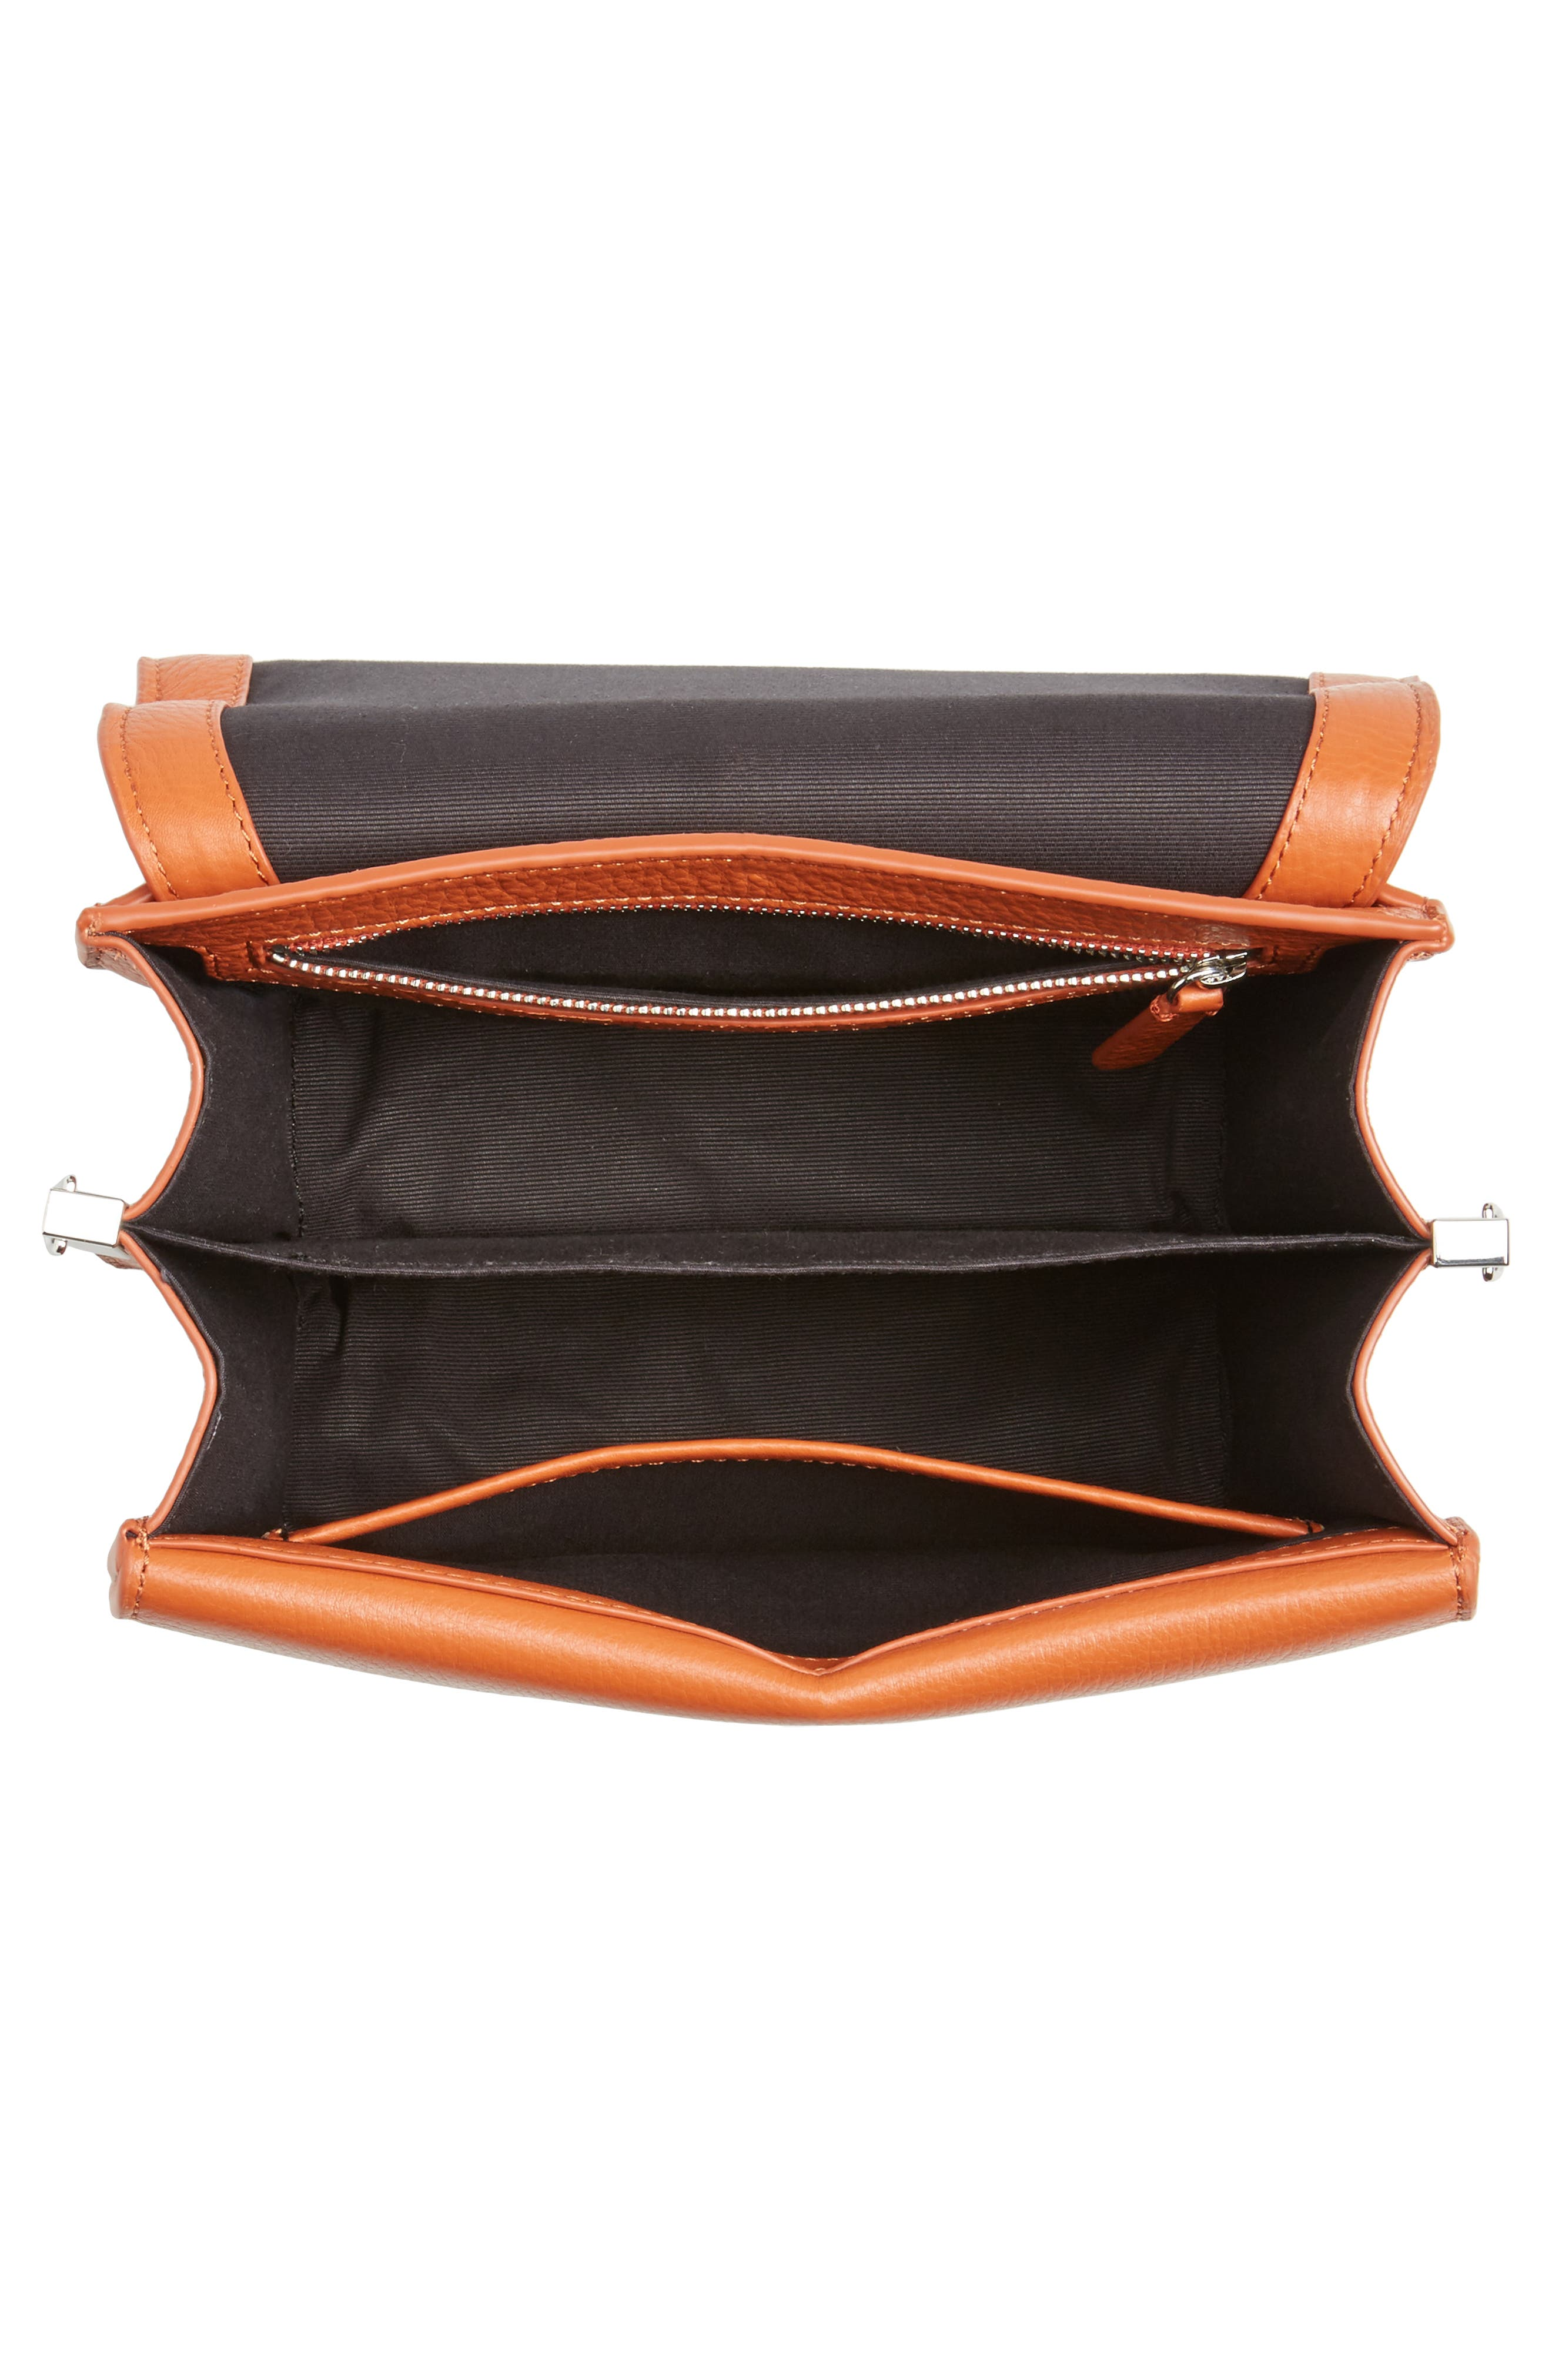 Landon Leather Crossbody Saddle Bag,                             Alternate thumbnail 16, color,